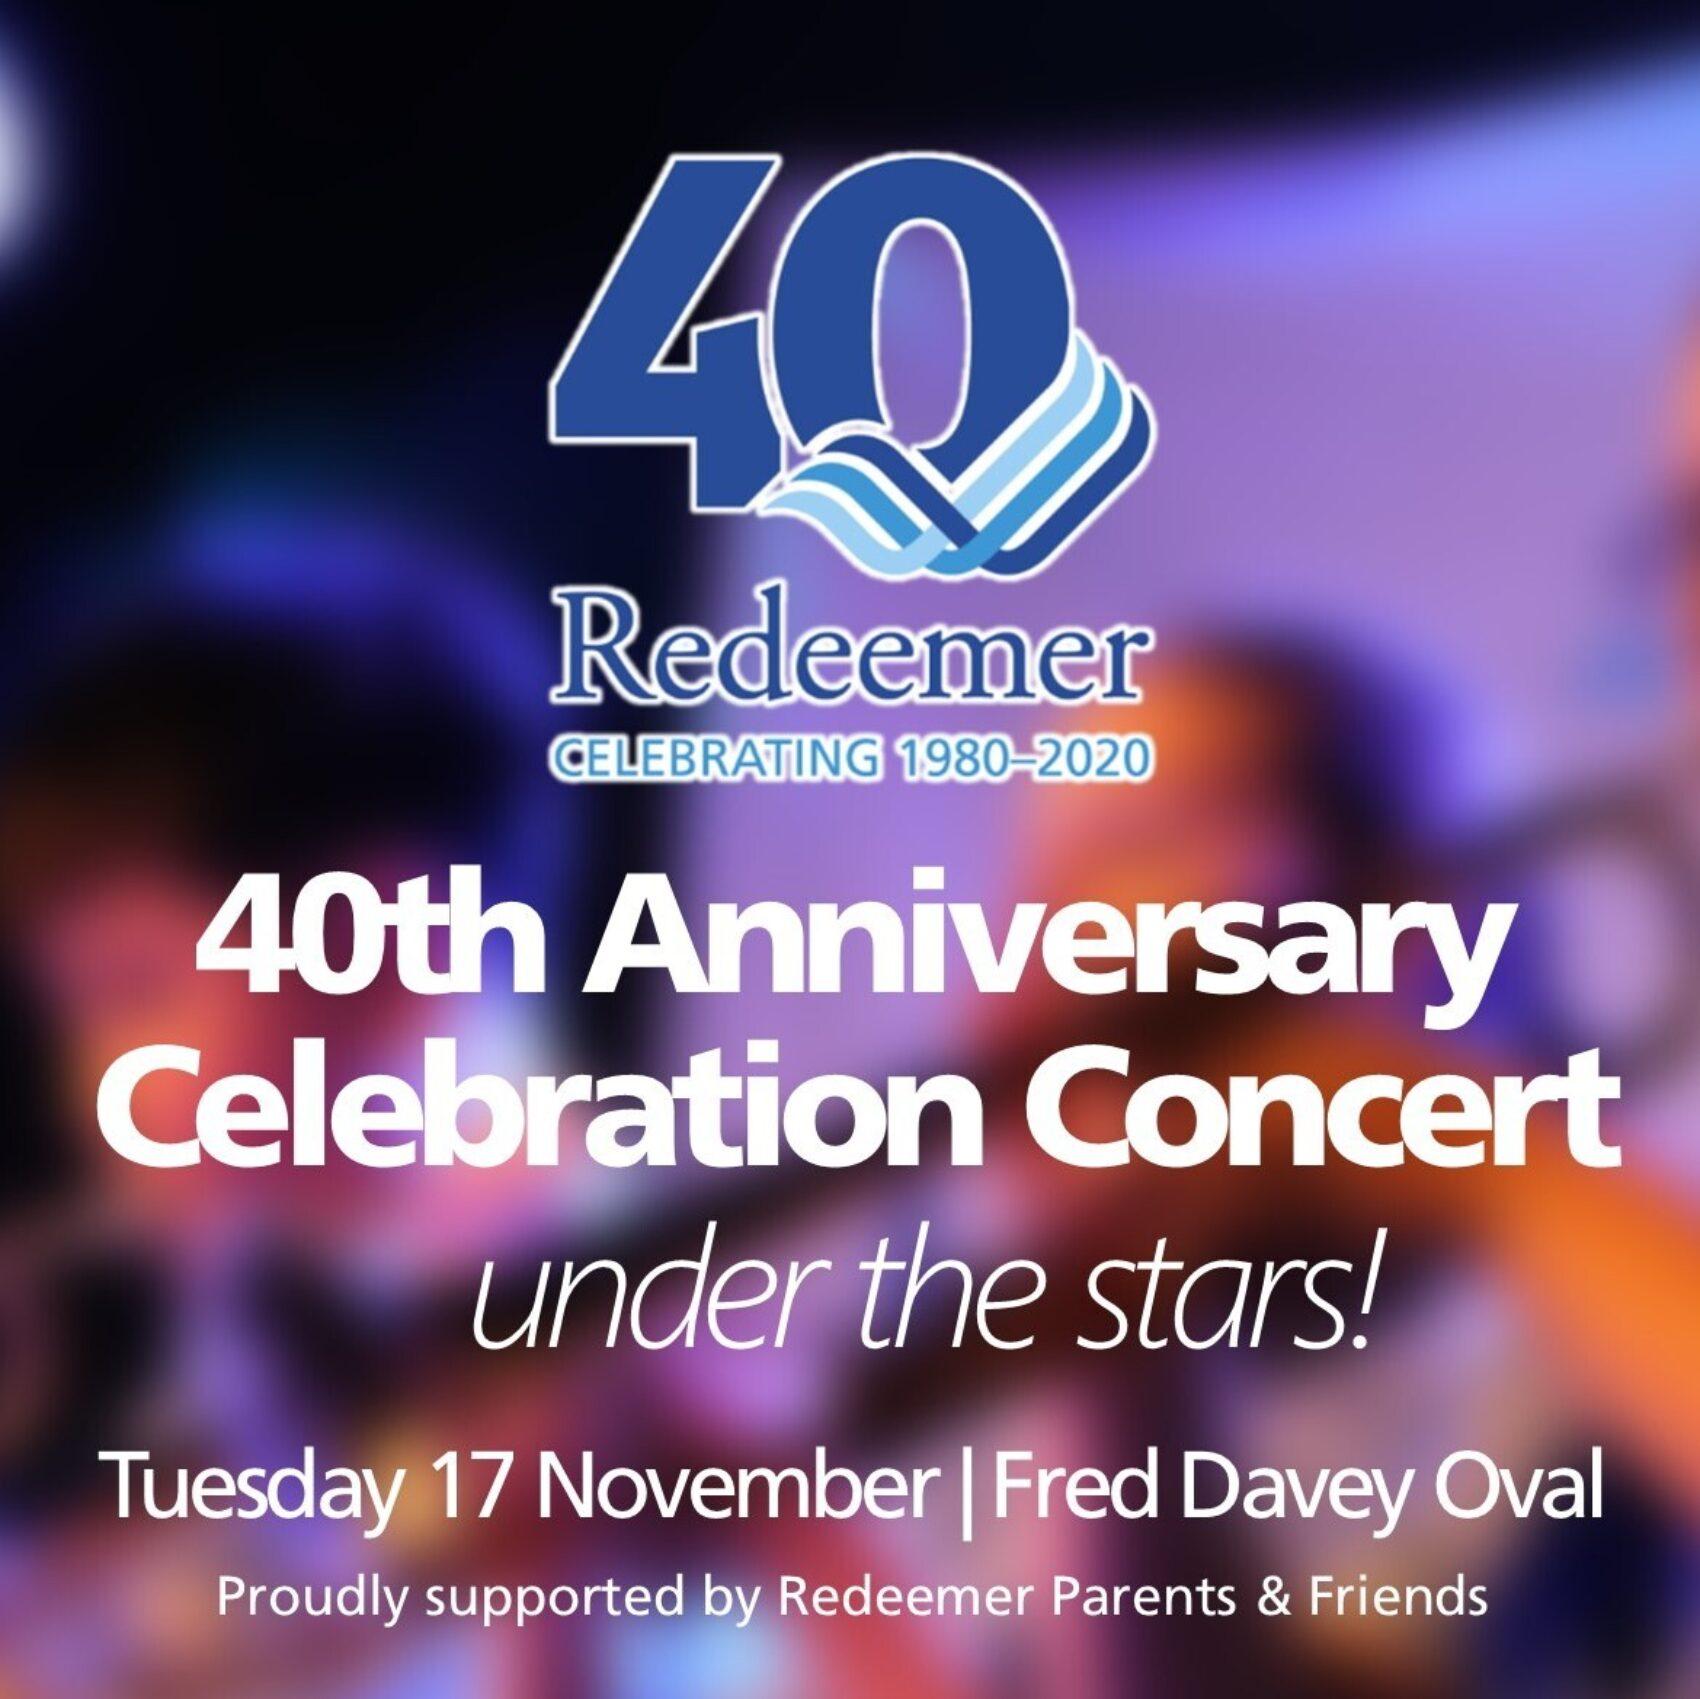 Redeemer's 40th Anniversary Celebration Concert – Under the Stars!